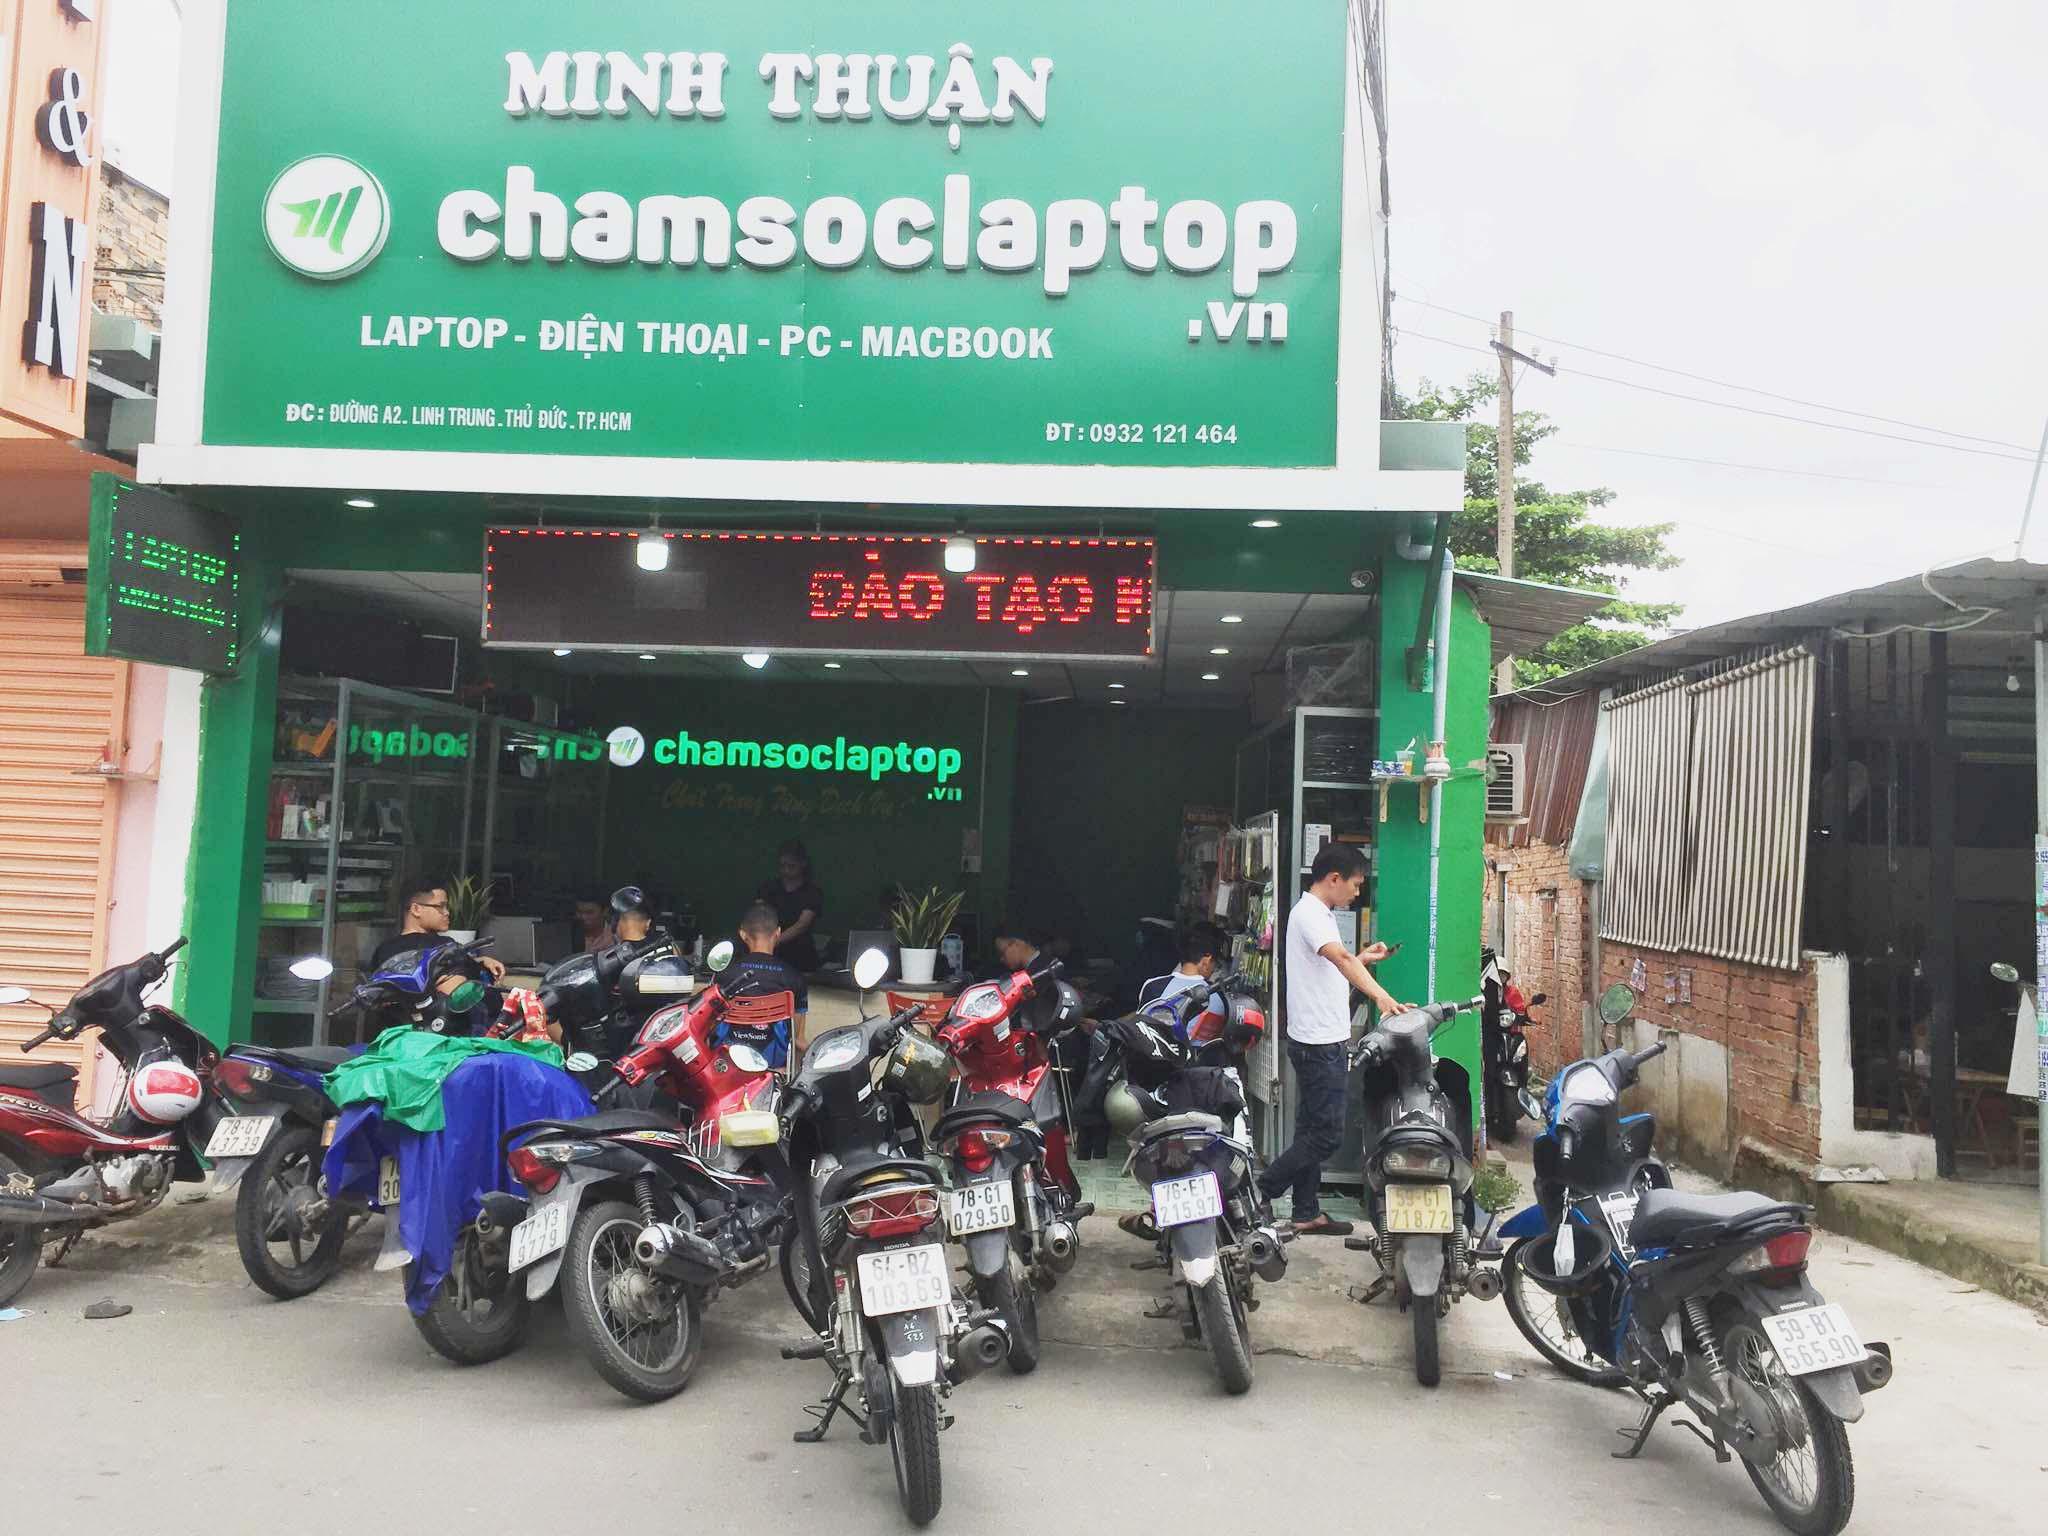 Sửa chữa laptop Thủ Đức - Chamsoclaptop.vn